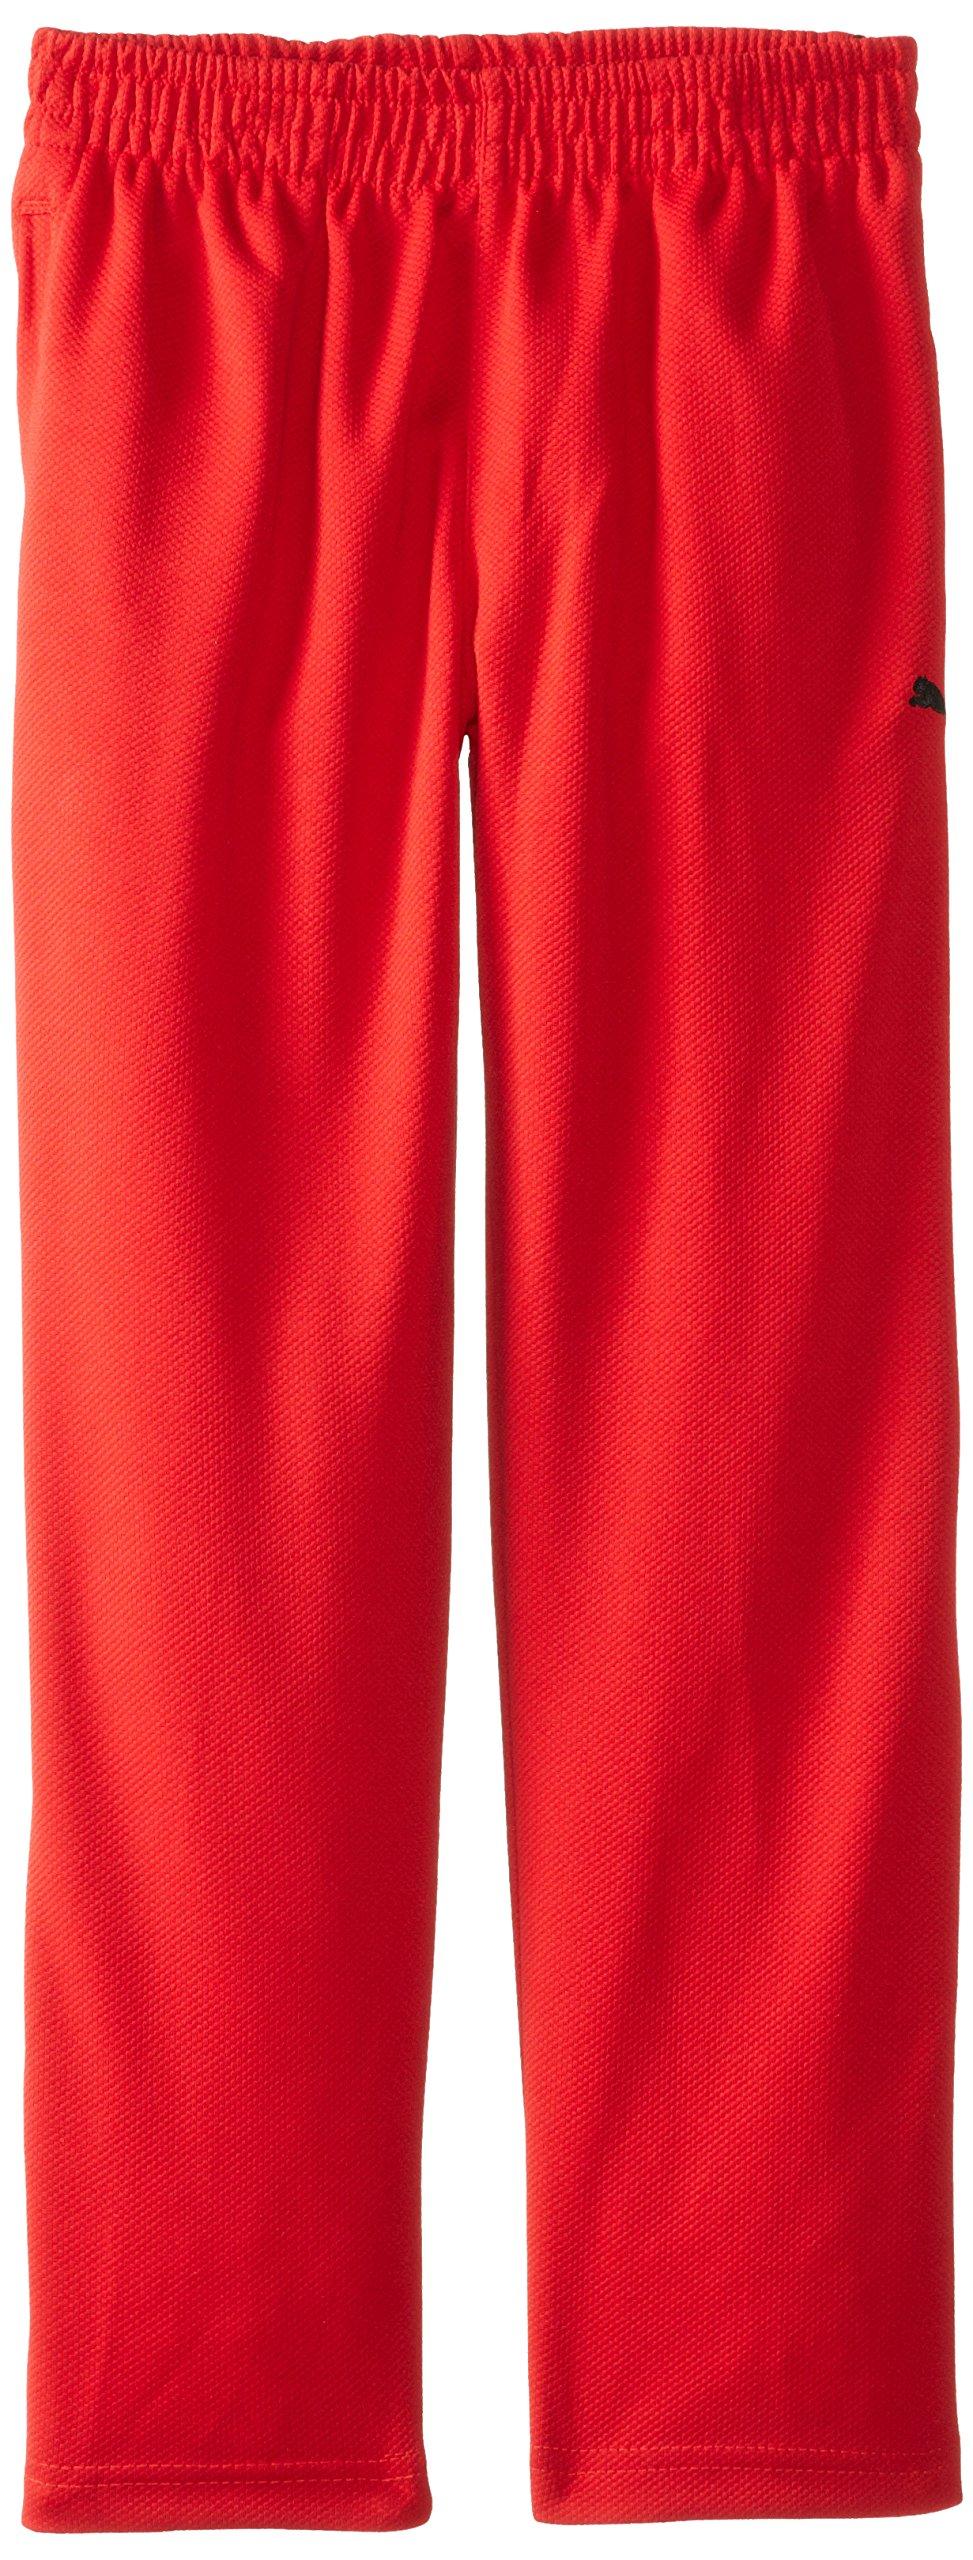 PUMA Big Boys' Training Pant, Red, Medium